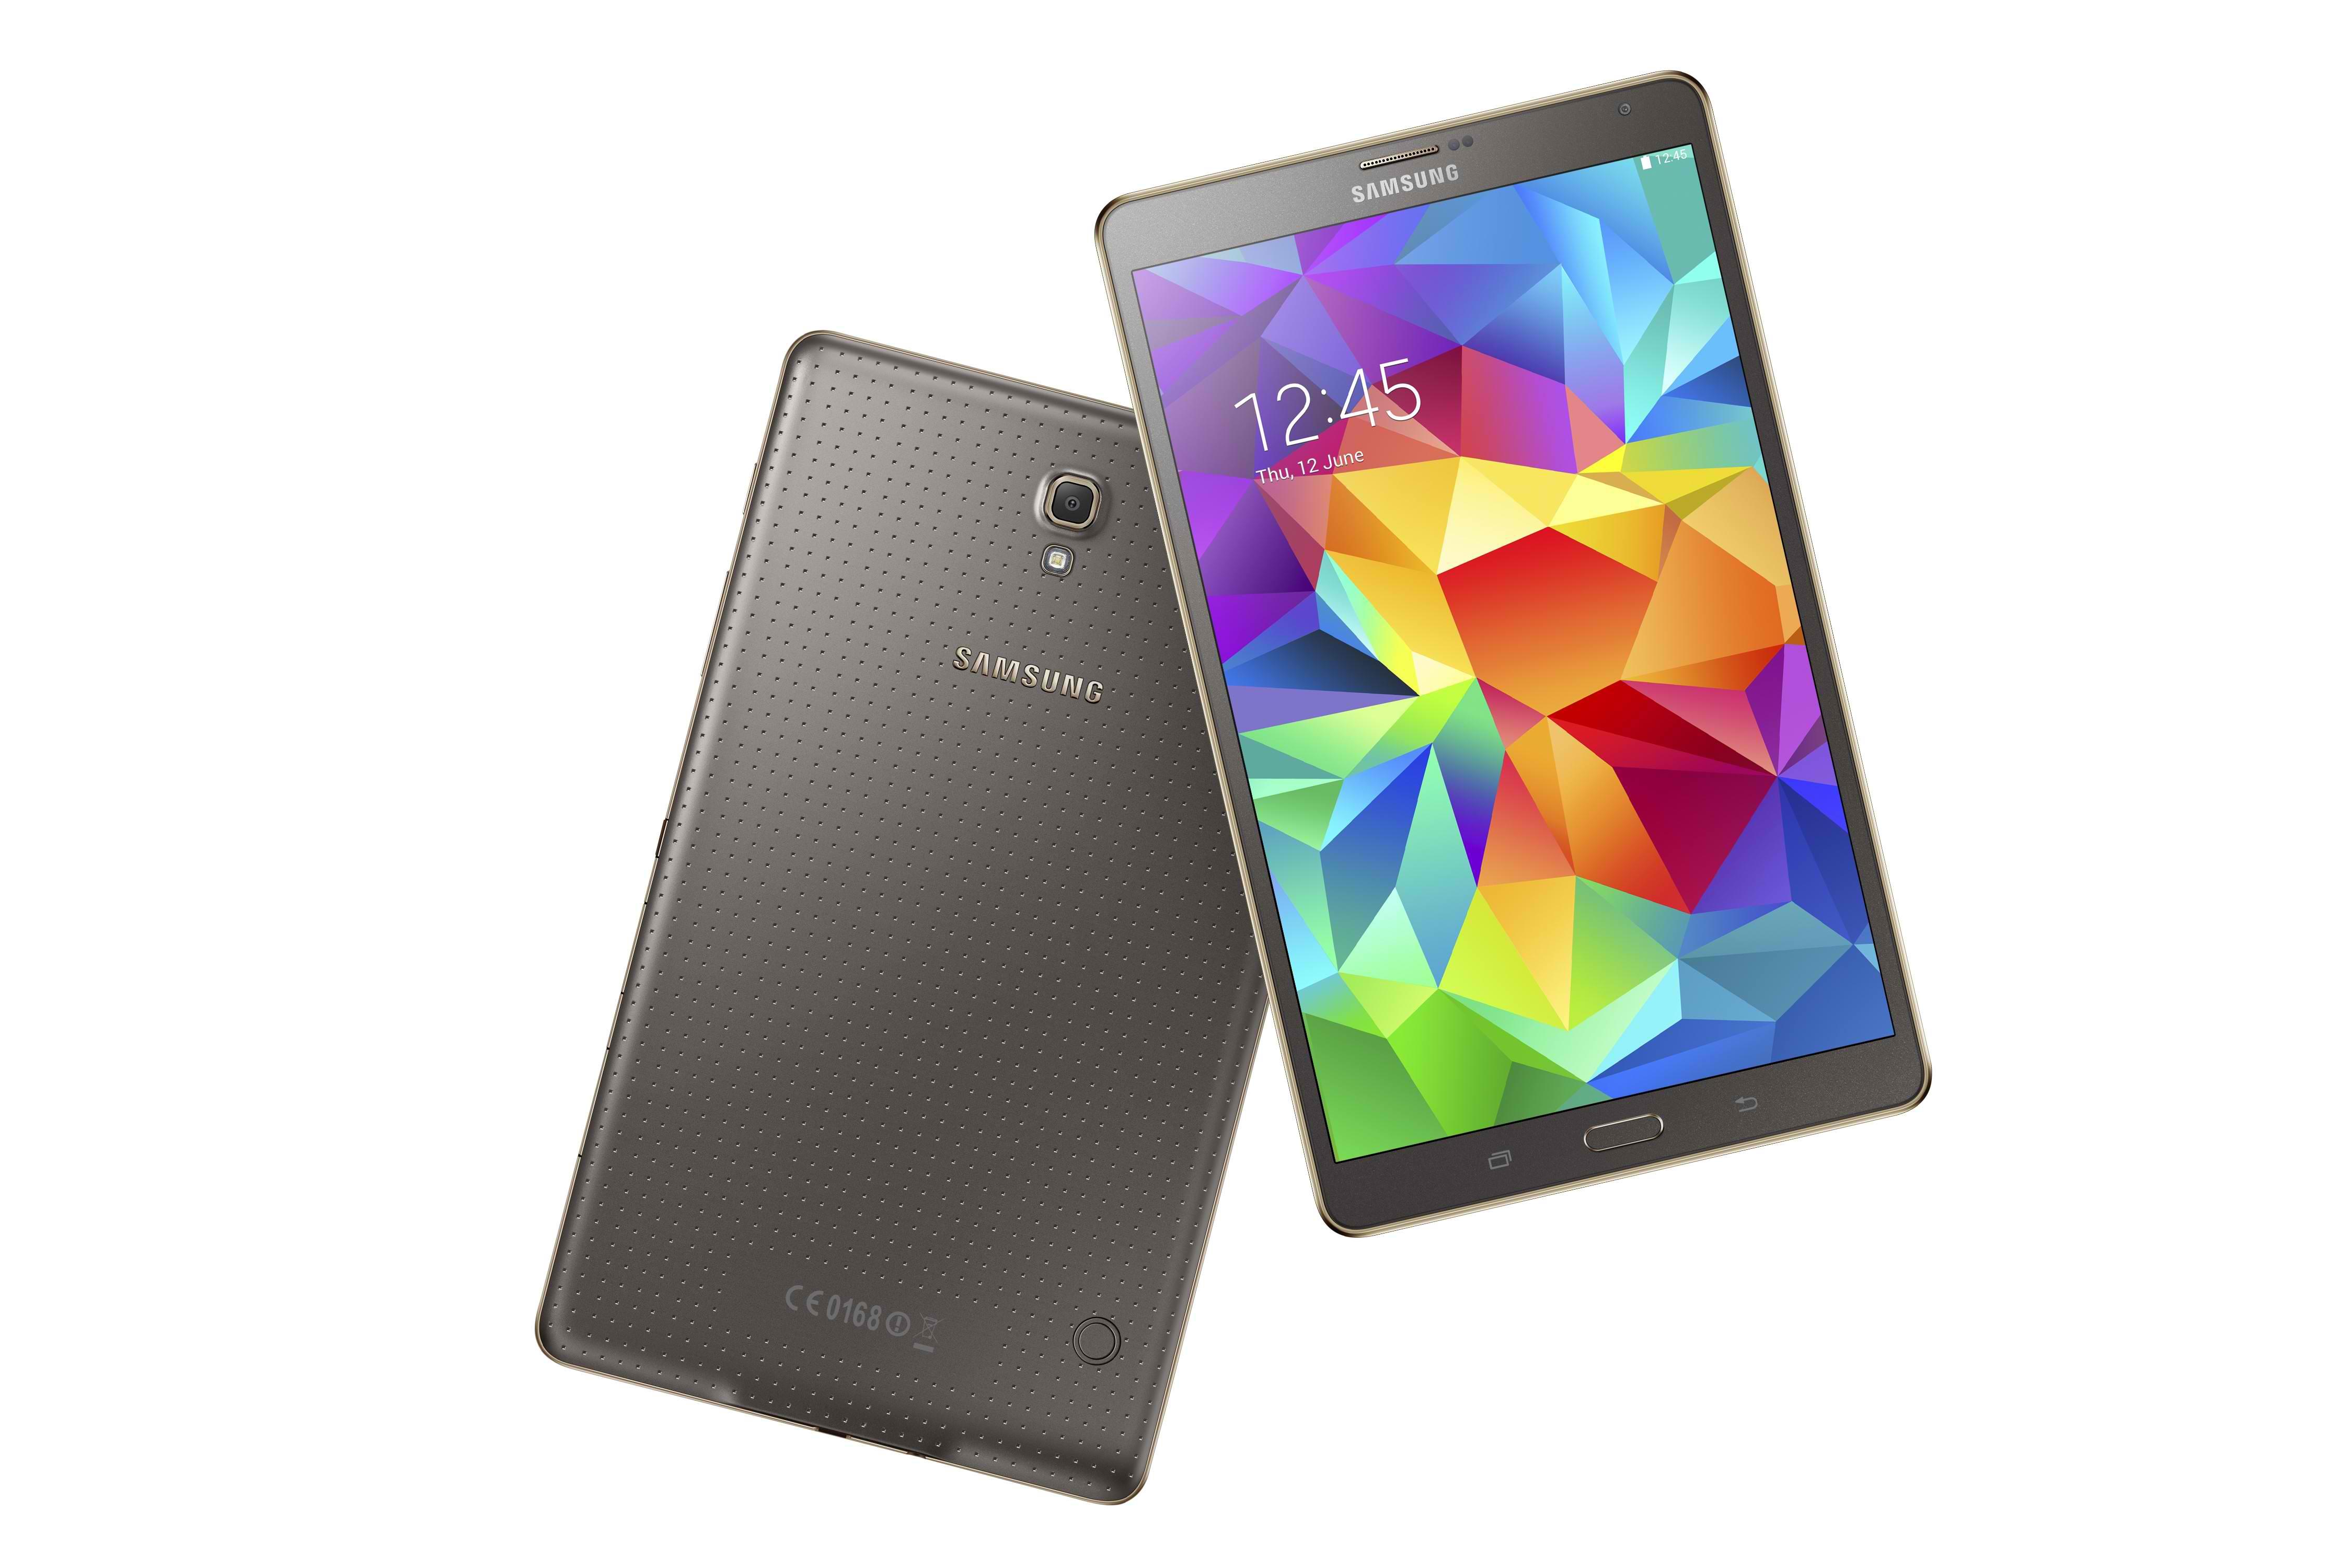 Tableta Samsung Galaxy Tab S2 a fost anuntata - specificatii oficiale